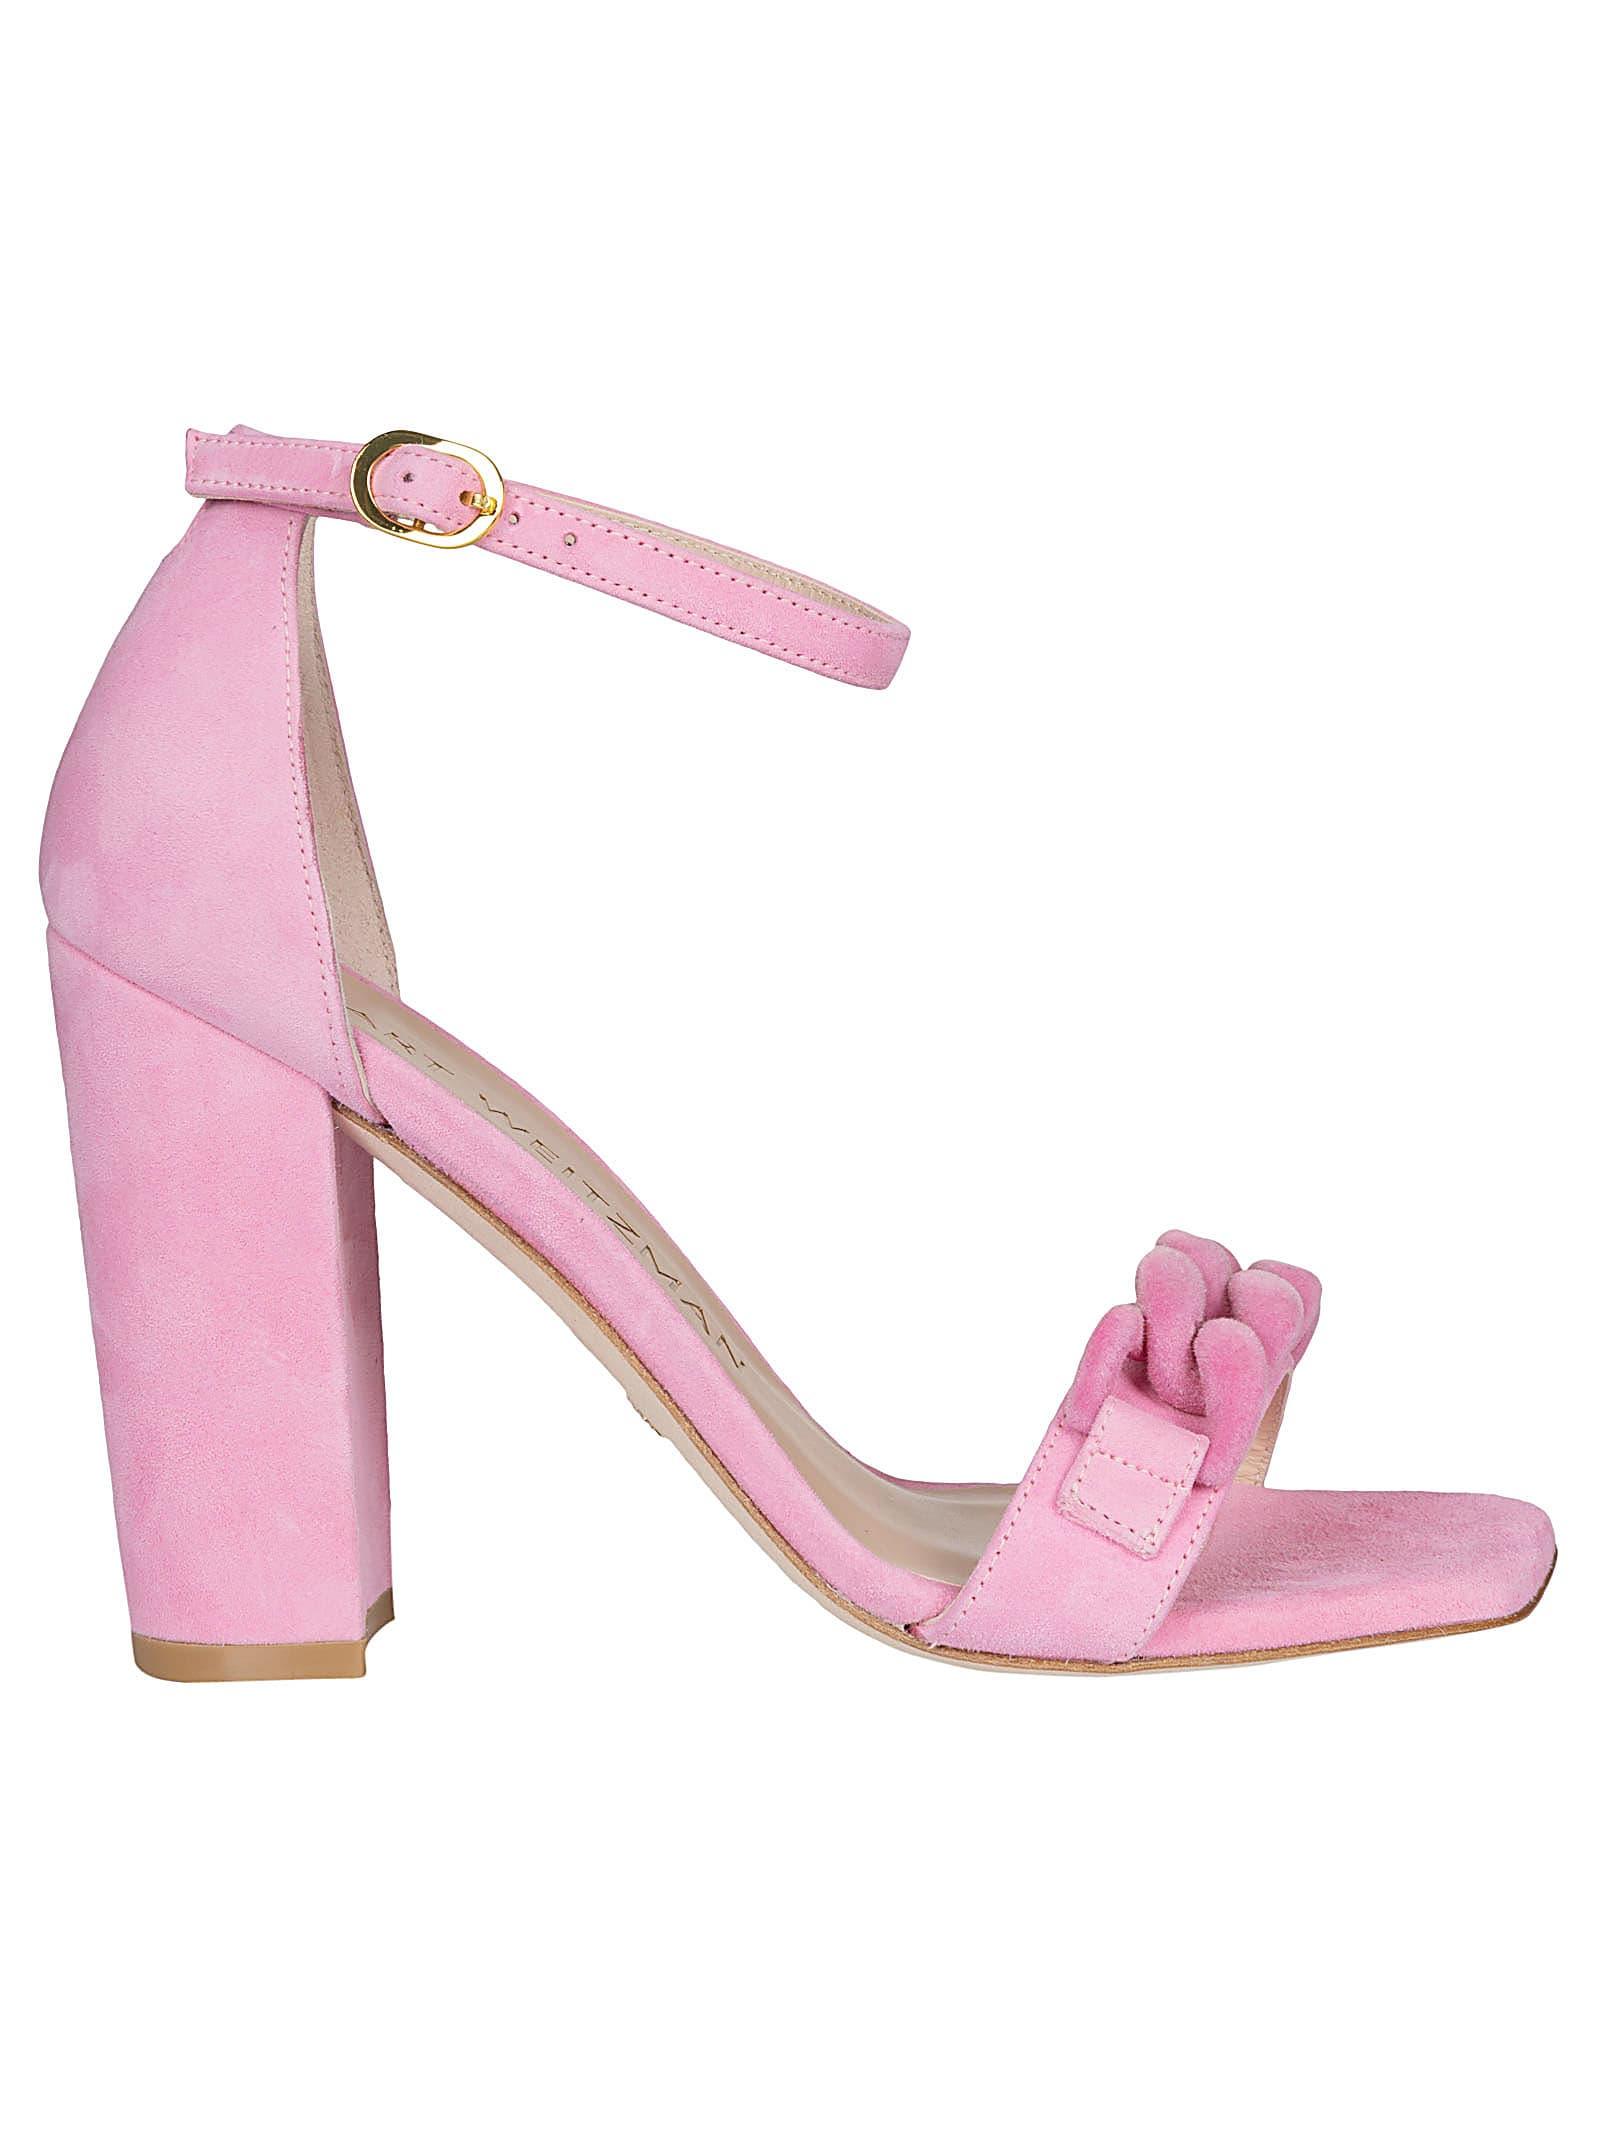 Buy Stuart Weitzman Amelina Block 100 Sandals online, shop Stuart Weitzman shoes with free shipping